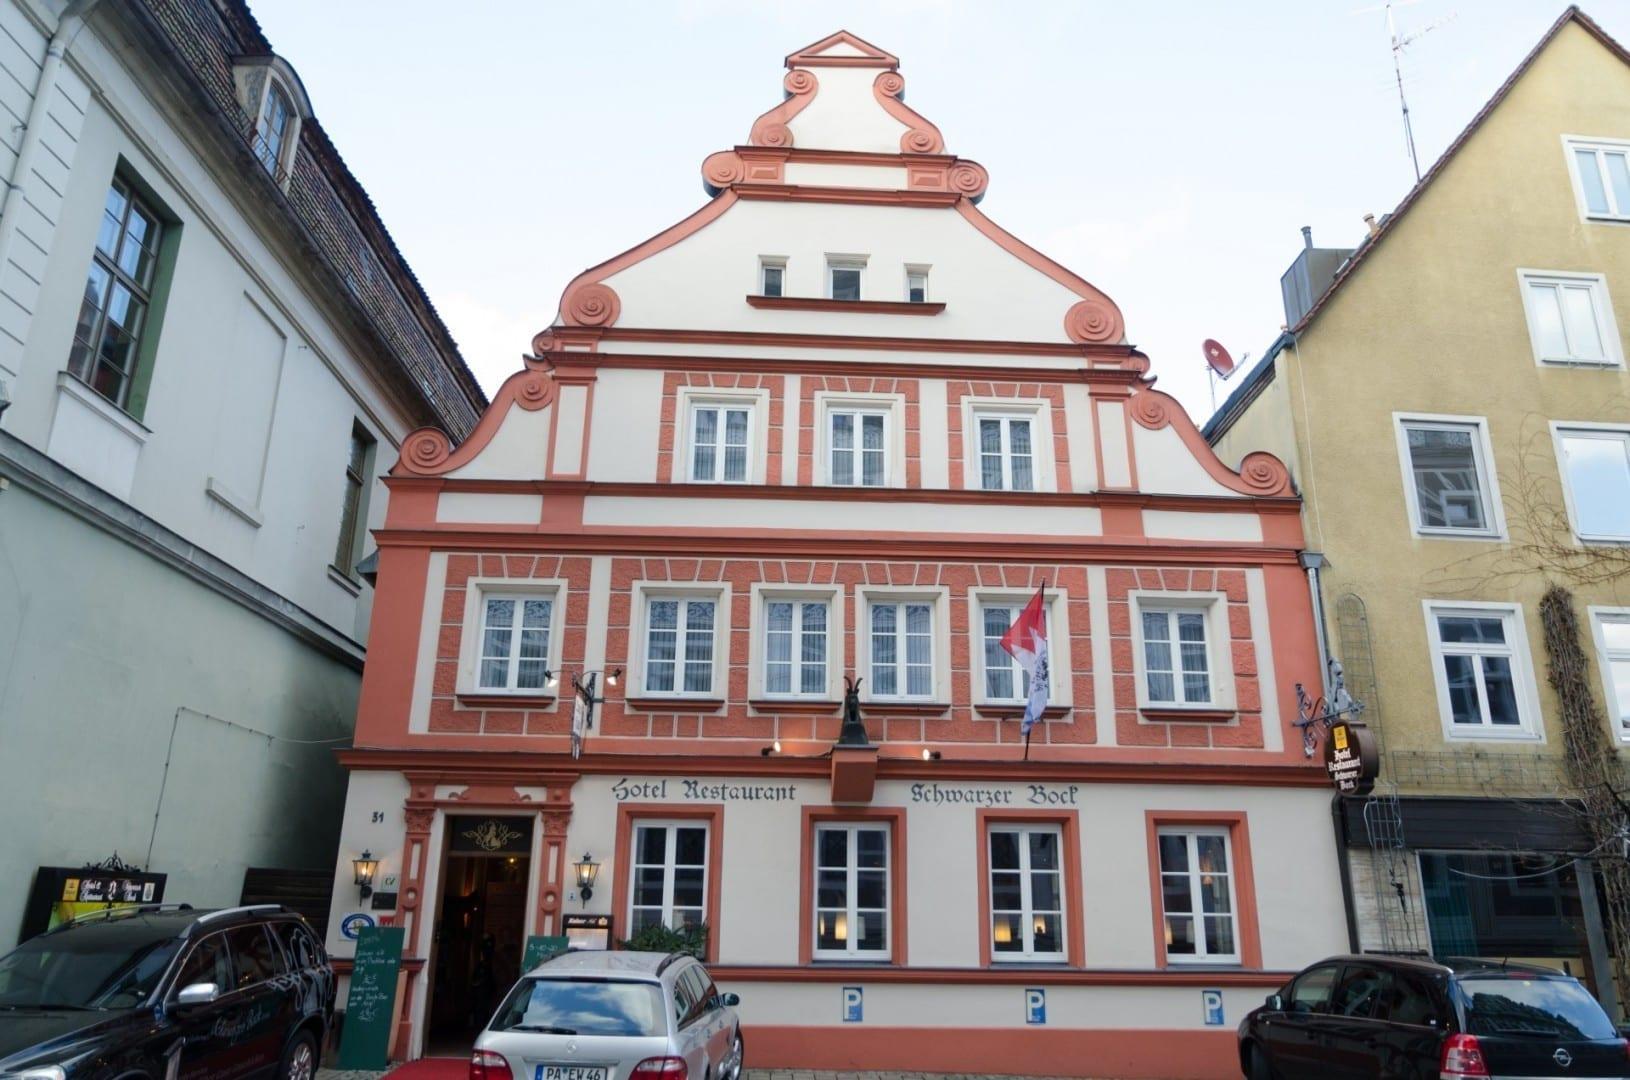 Hotel y restaurante Schwarzer Bock Ansbach Alemania